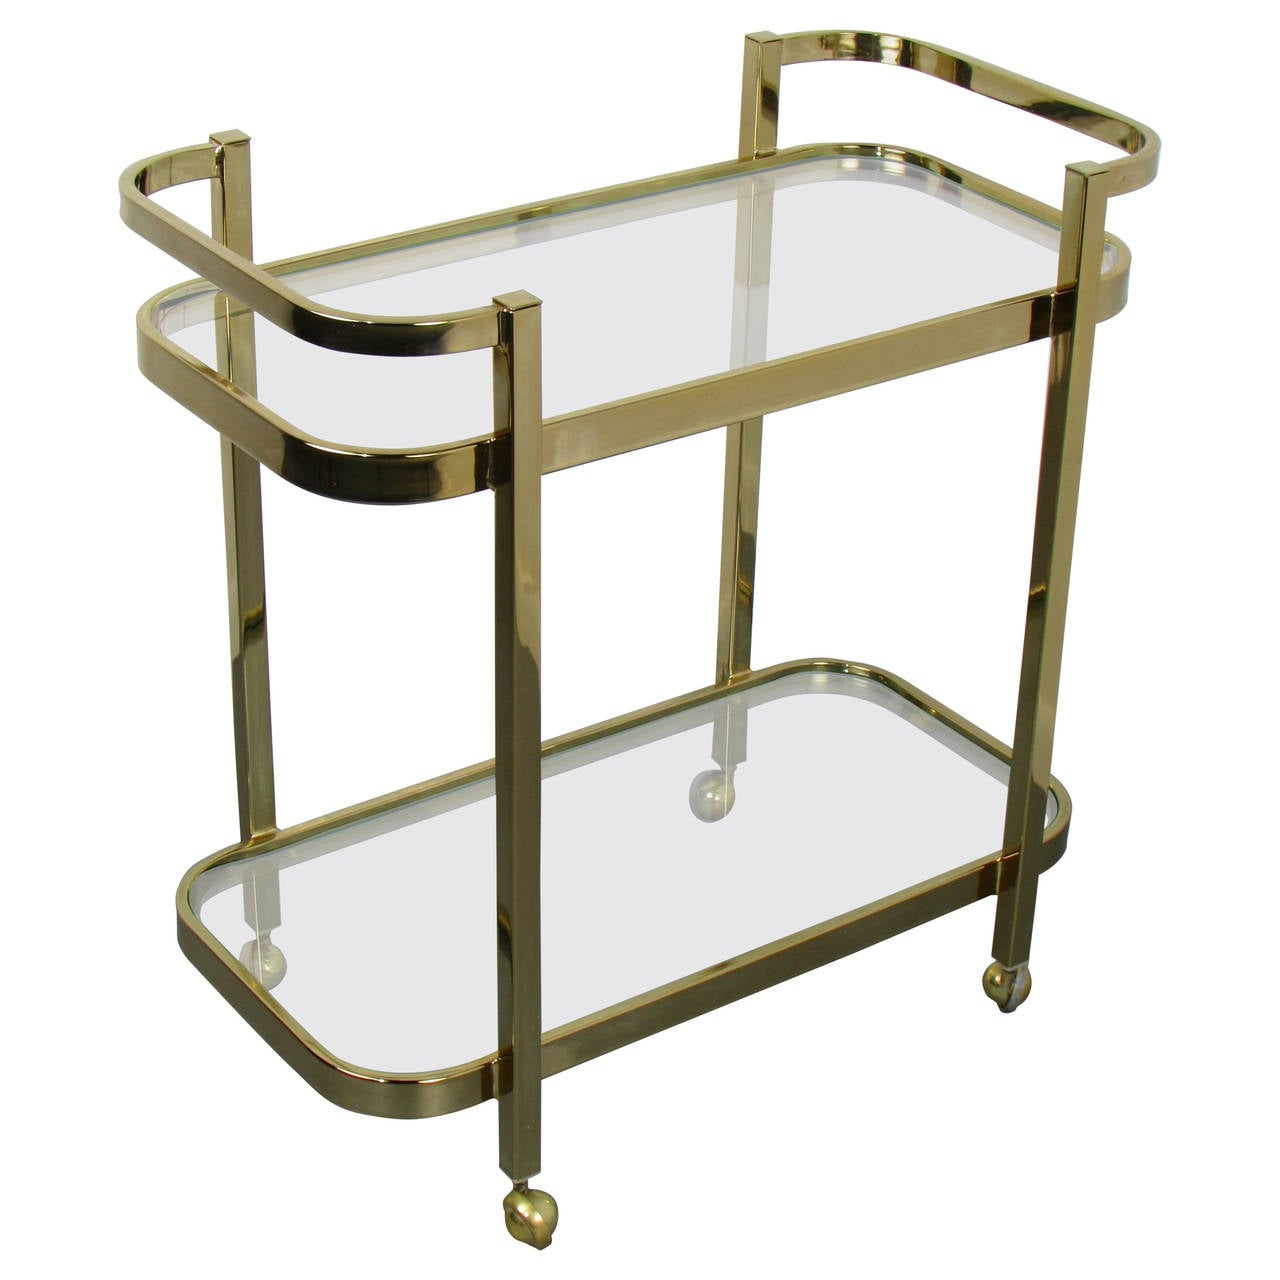 luscious brass bar cart by milo baughman for thayer coggin. Black Bedroom Furniture Sets. Home Design Ideas